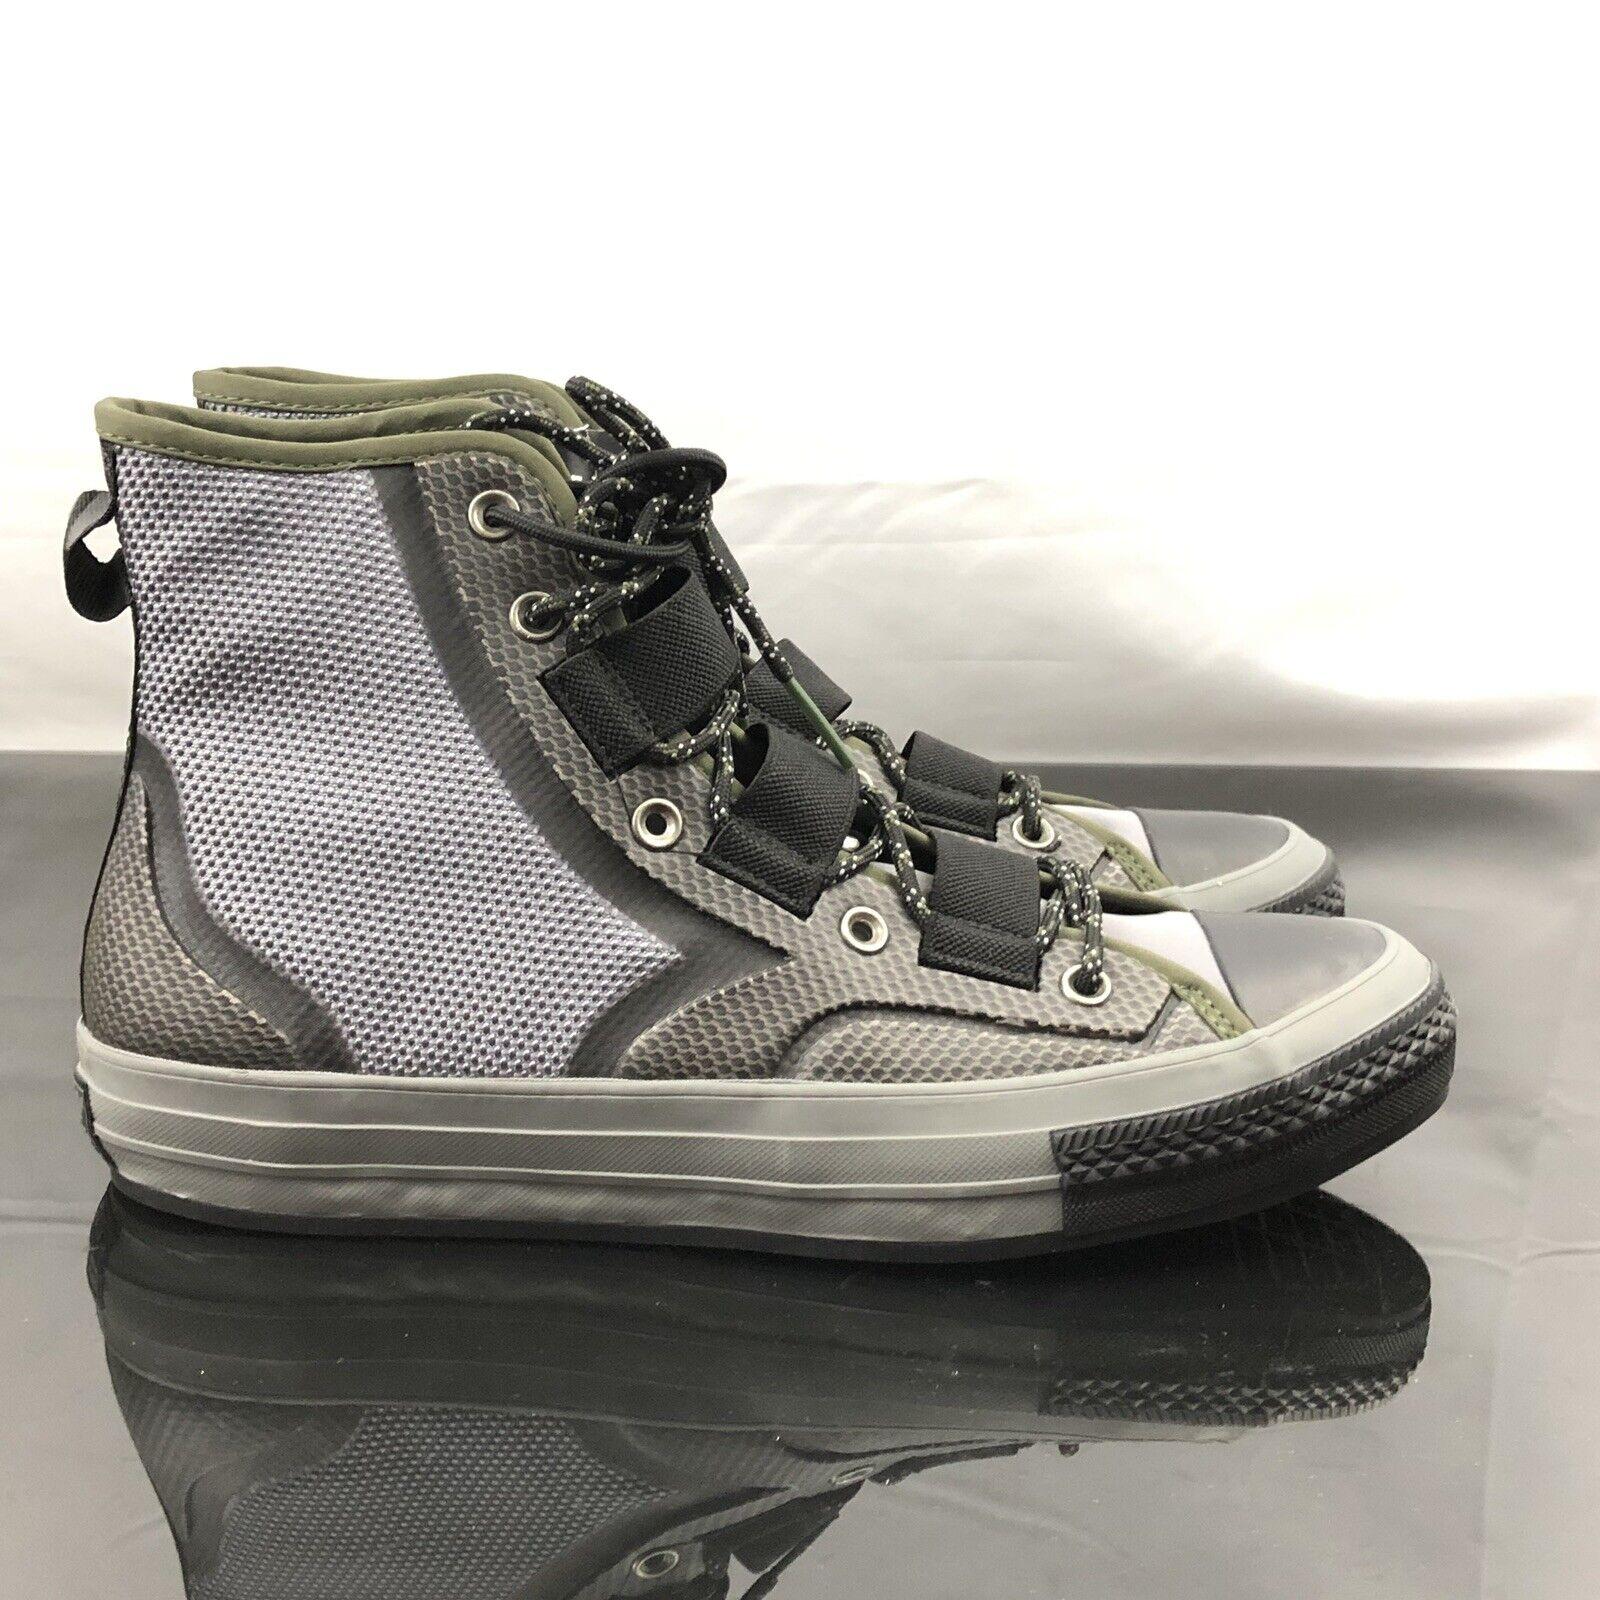 Converse Mens Chuck 70 Tech Hiker High Top Grey Green Black 162358C Sz 12